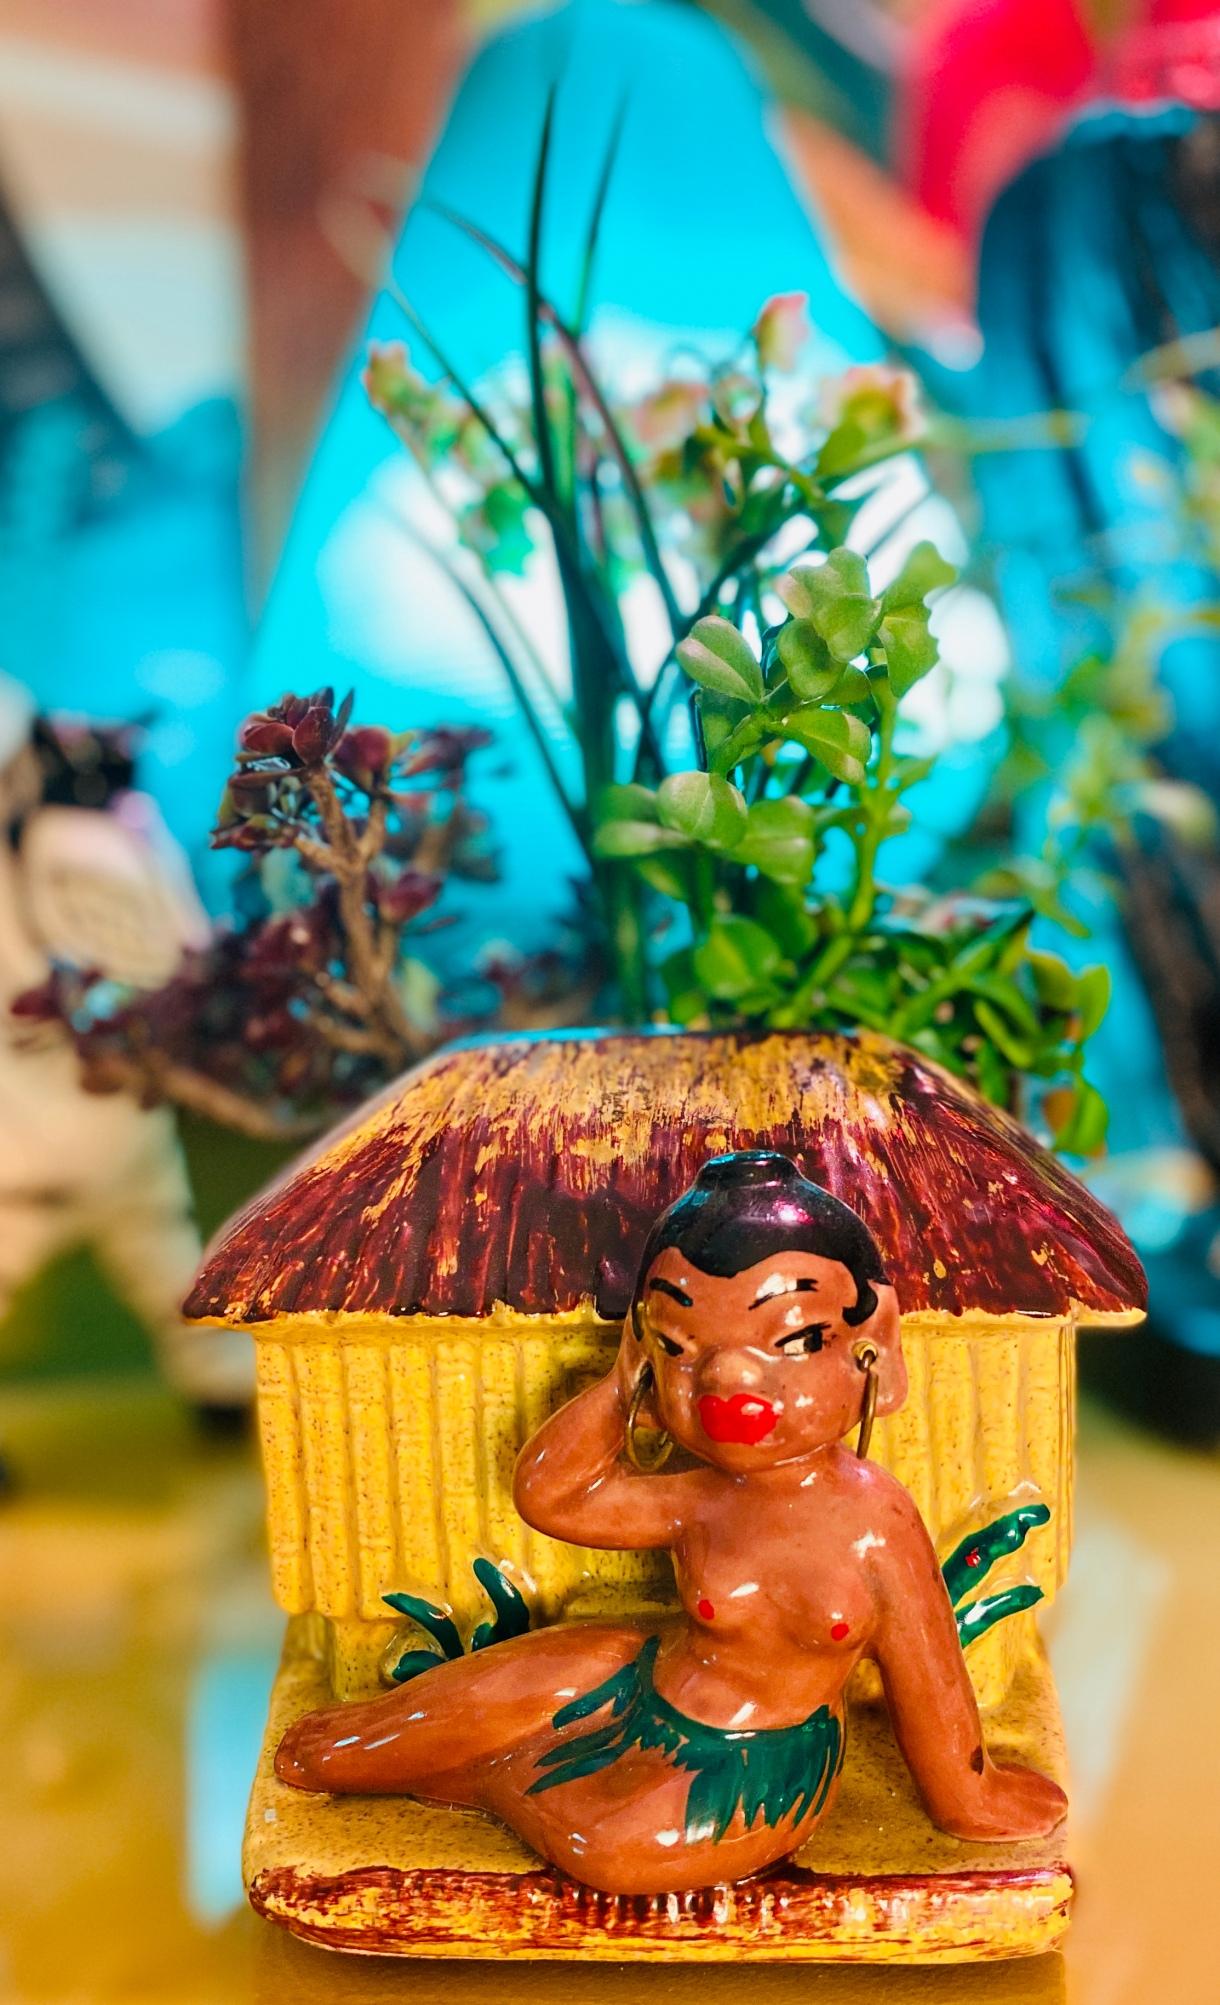 Vintage Novelty Tribal Figures (Blackmoore/Black Americana)